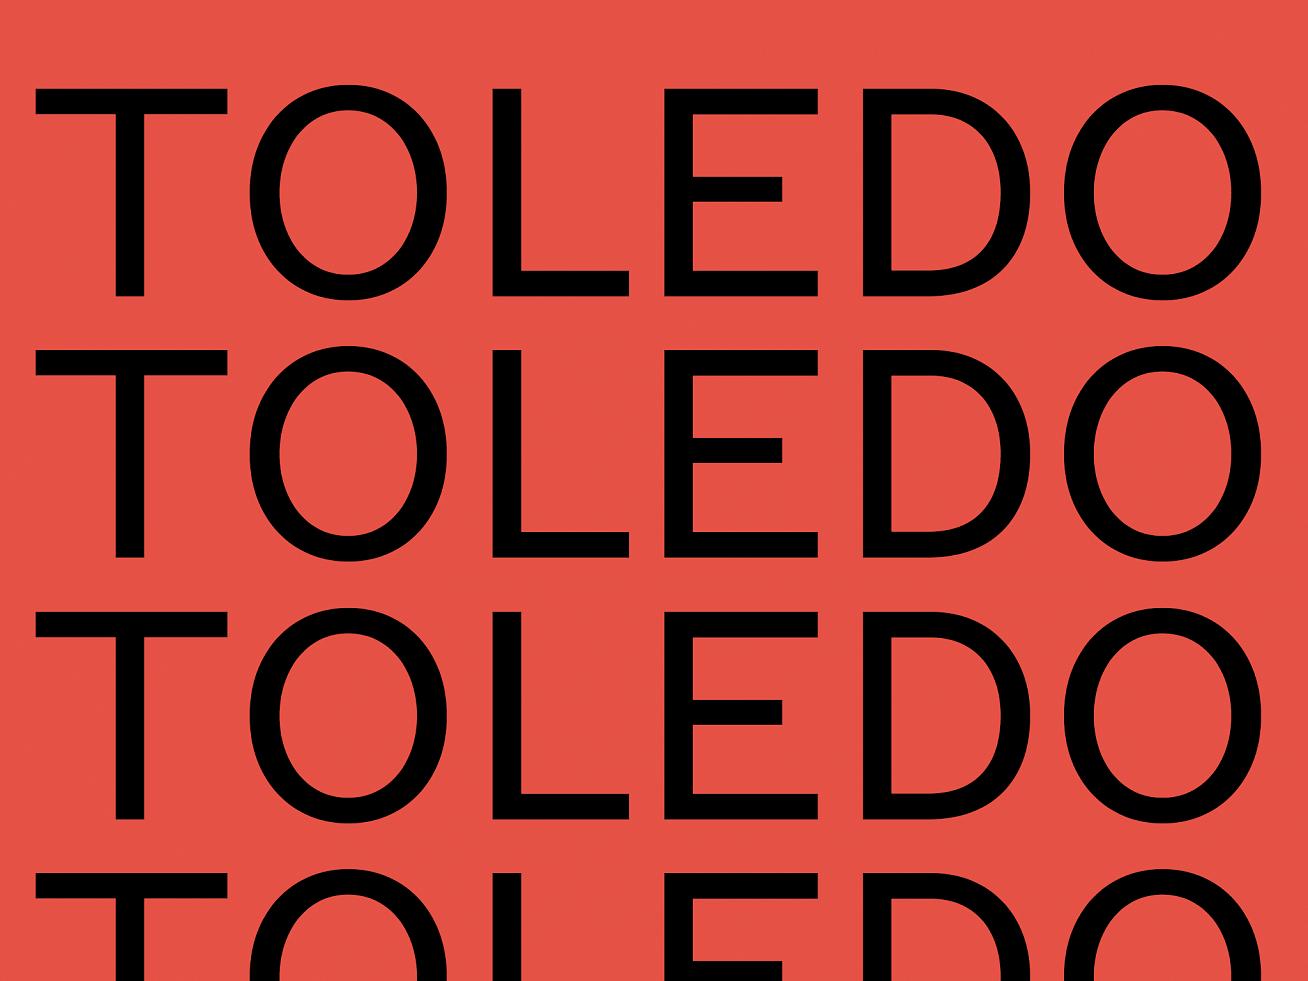 TOLEDO  Website for a support program for translators.